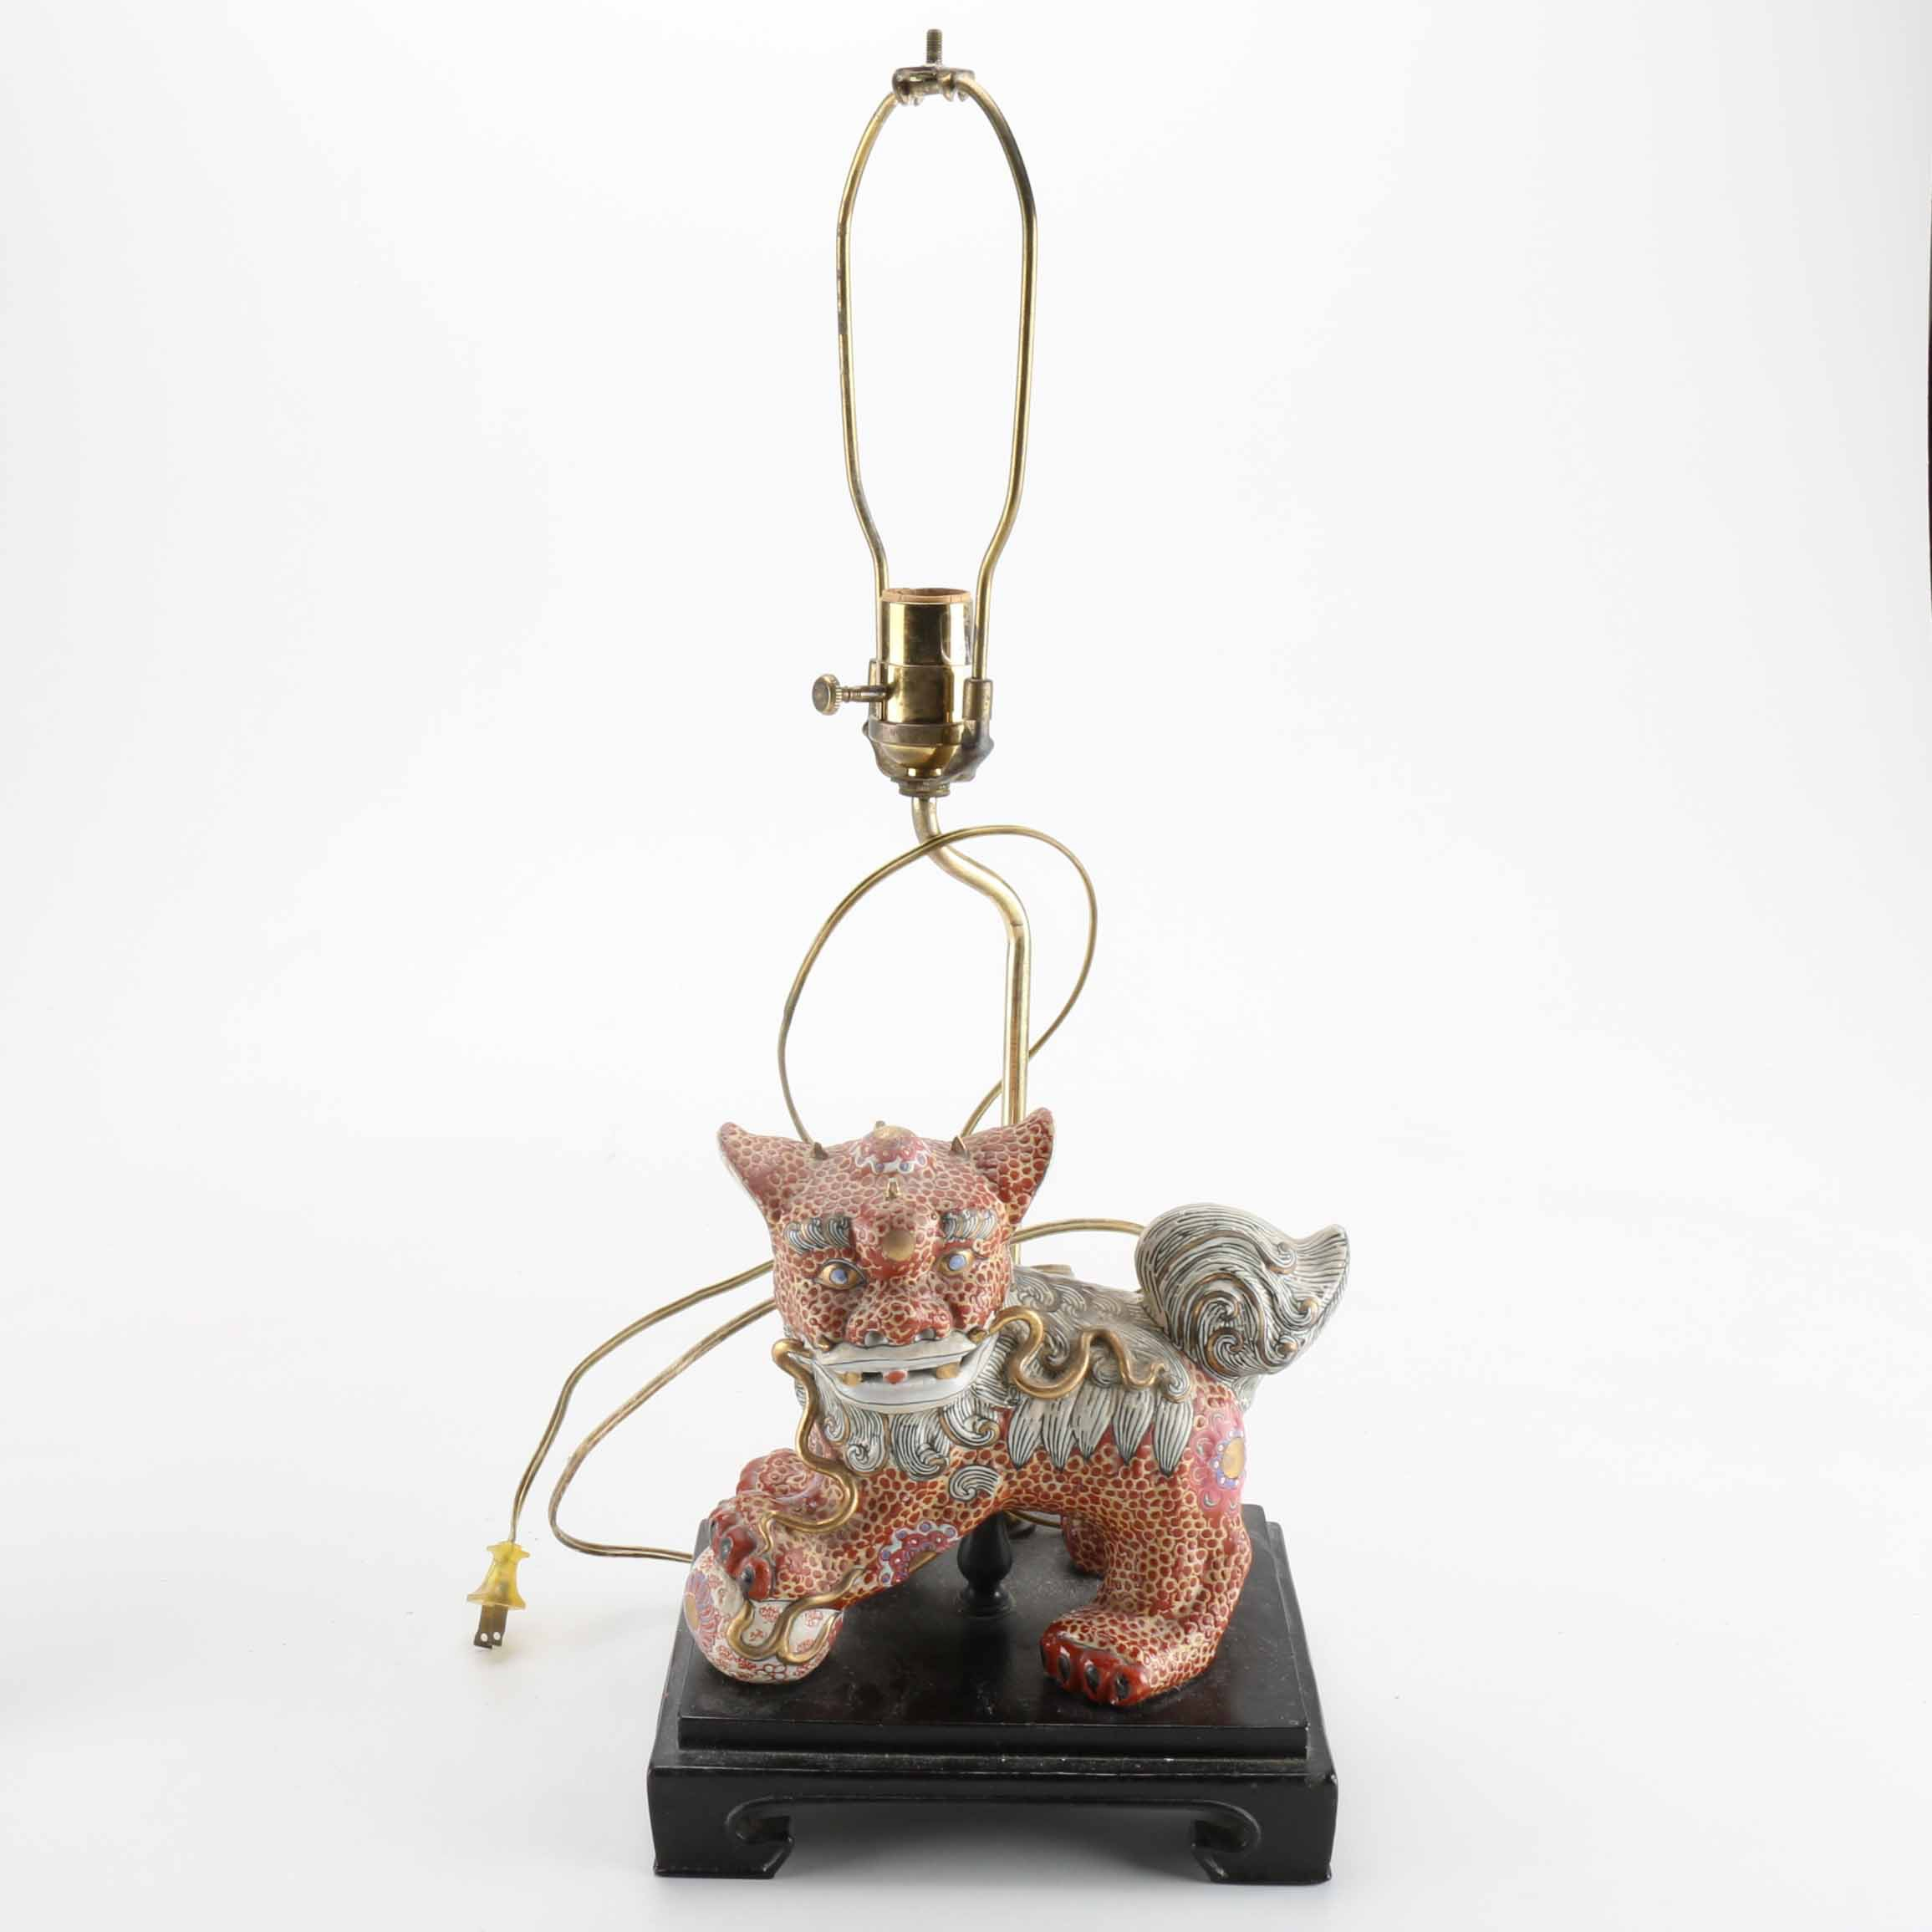 Chinese Ceramic Guardian Lion Lamp